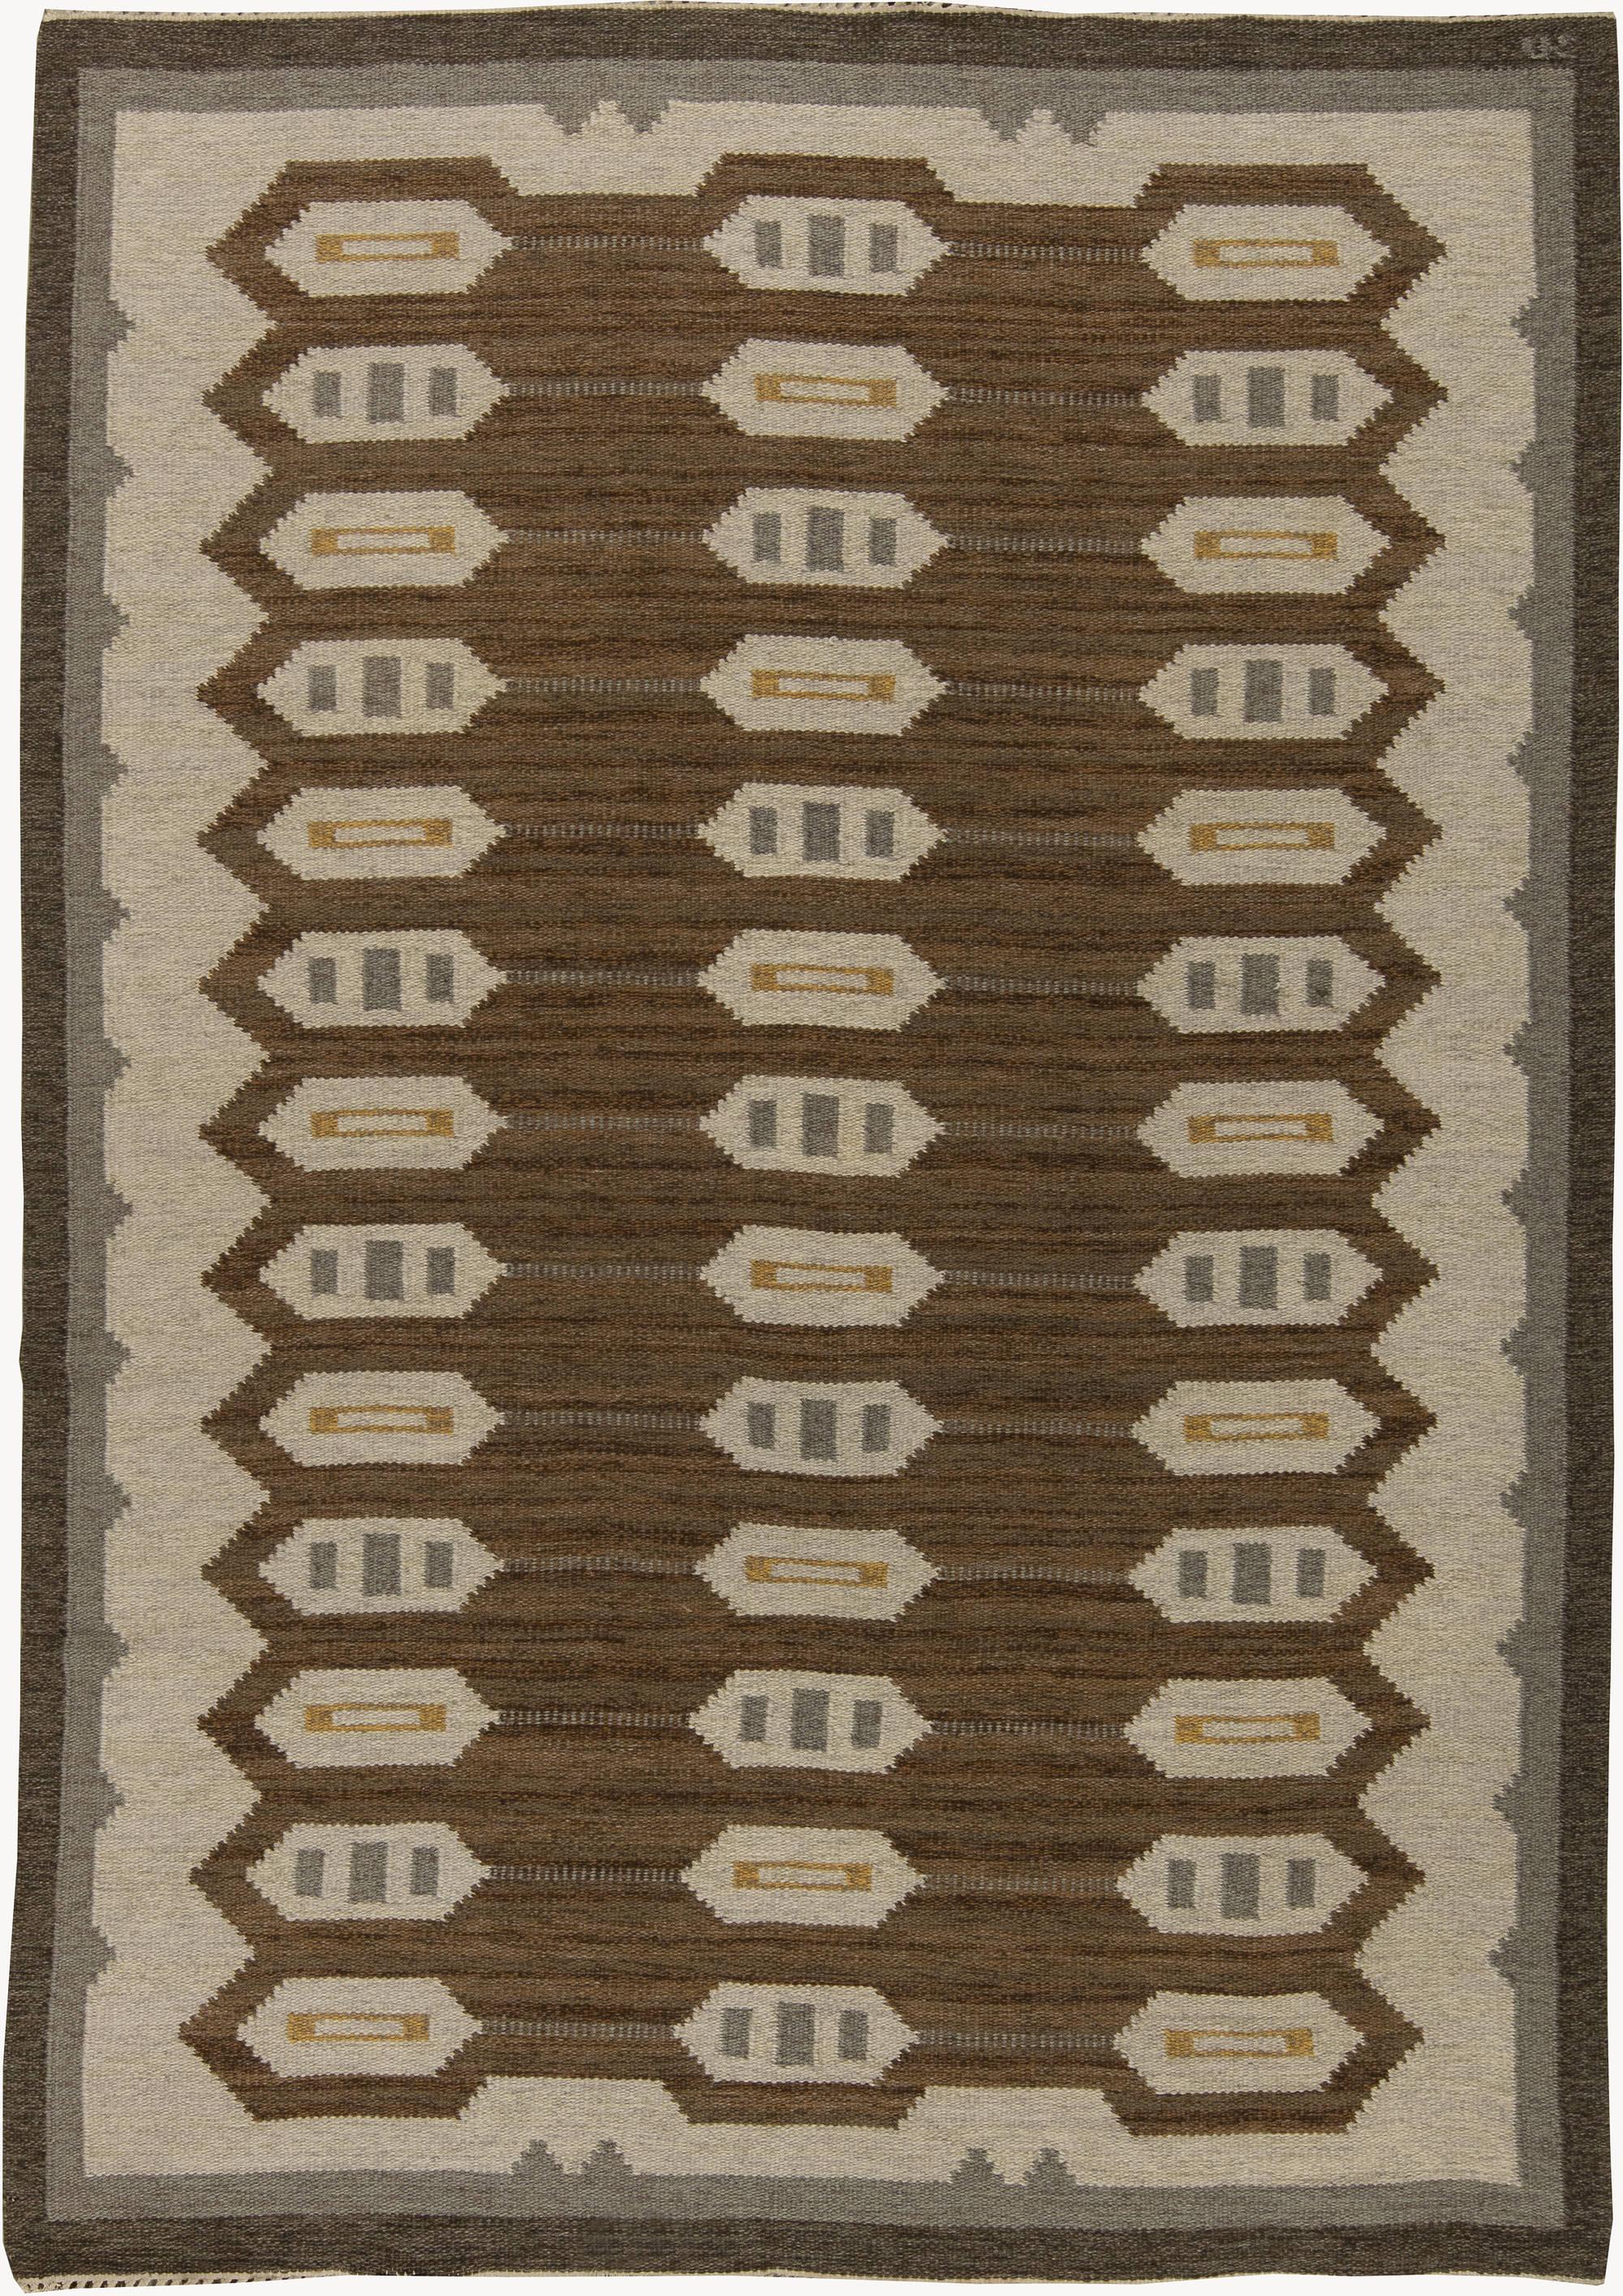 Vintage Swedish Flat Weave Rug BB6281